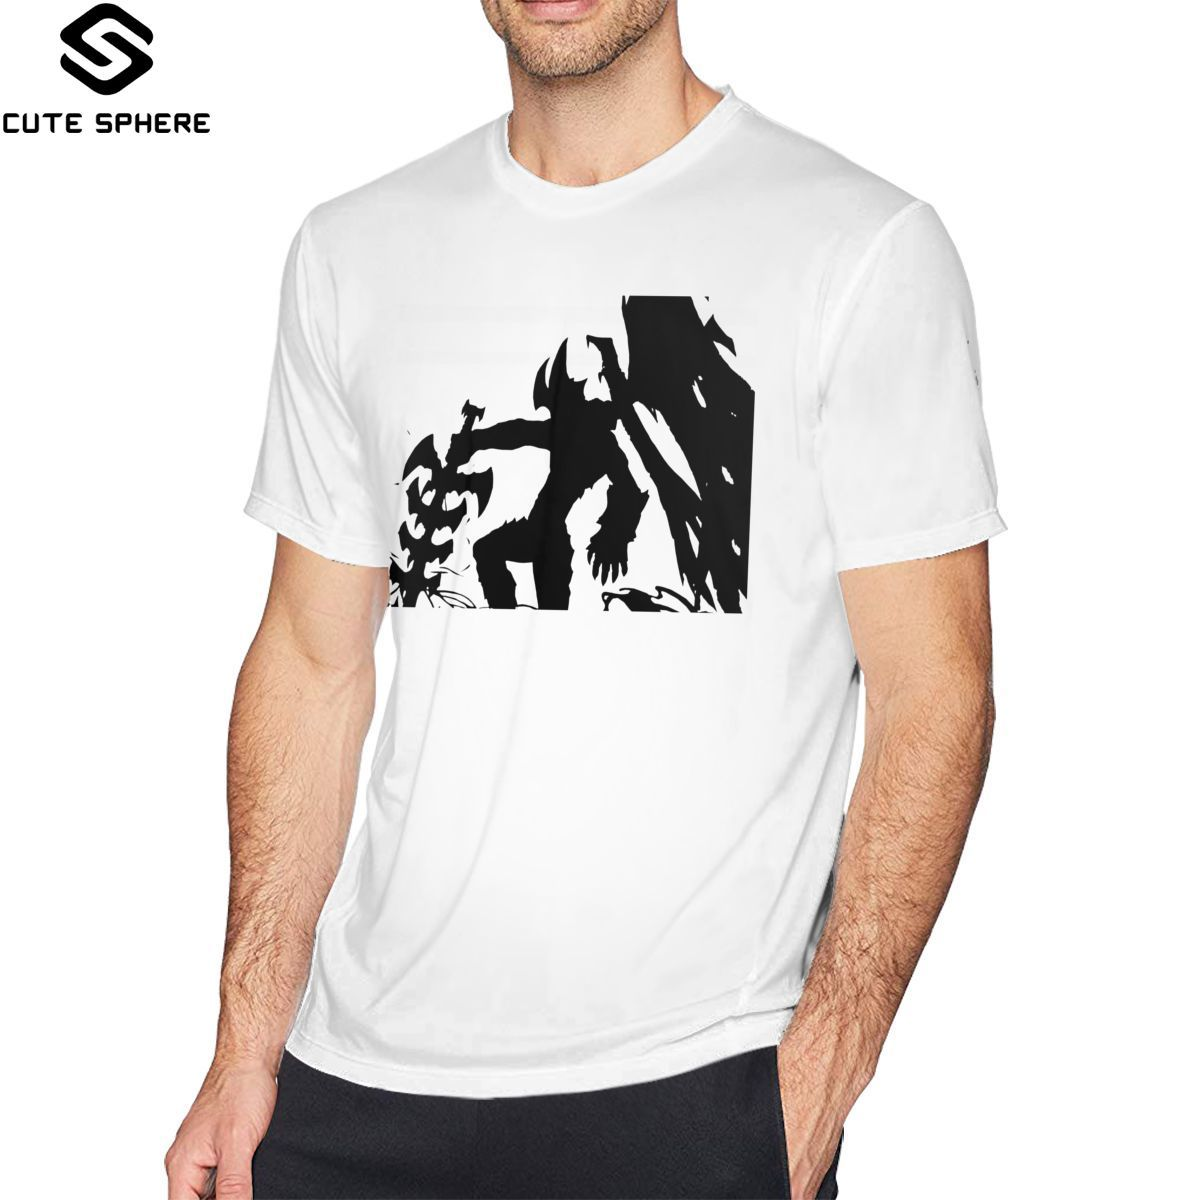 Aatrox T Shirt Aatrox T-Shirt Short-Sleeve 100 Percent Cotton Tee Shirt Funny Streetwear Graphic Man Tshirt